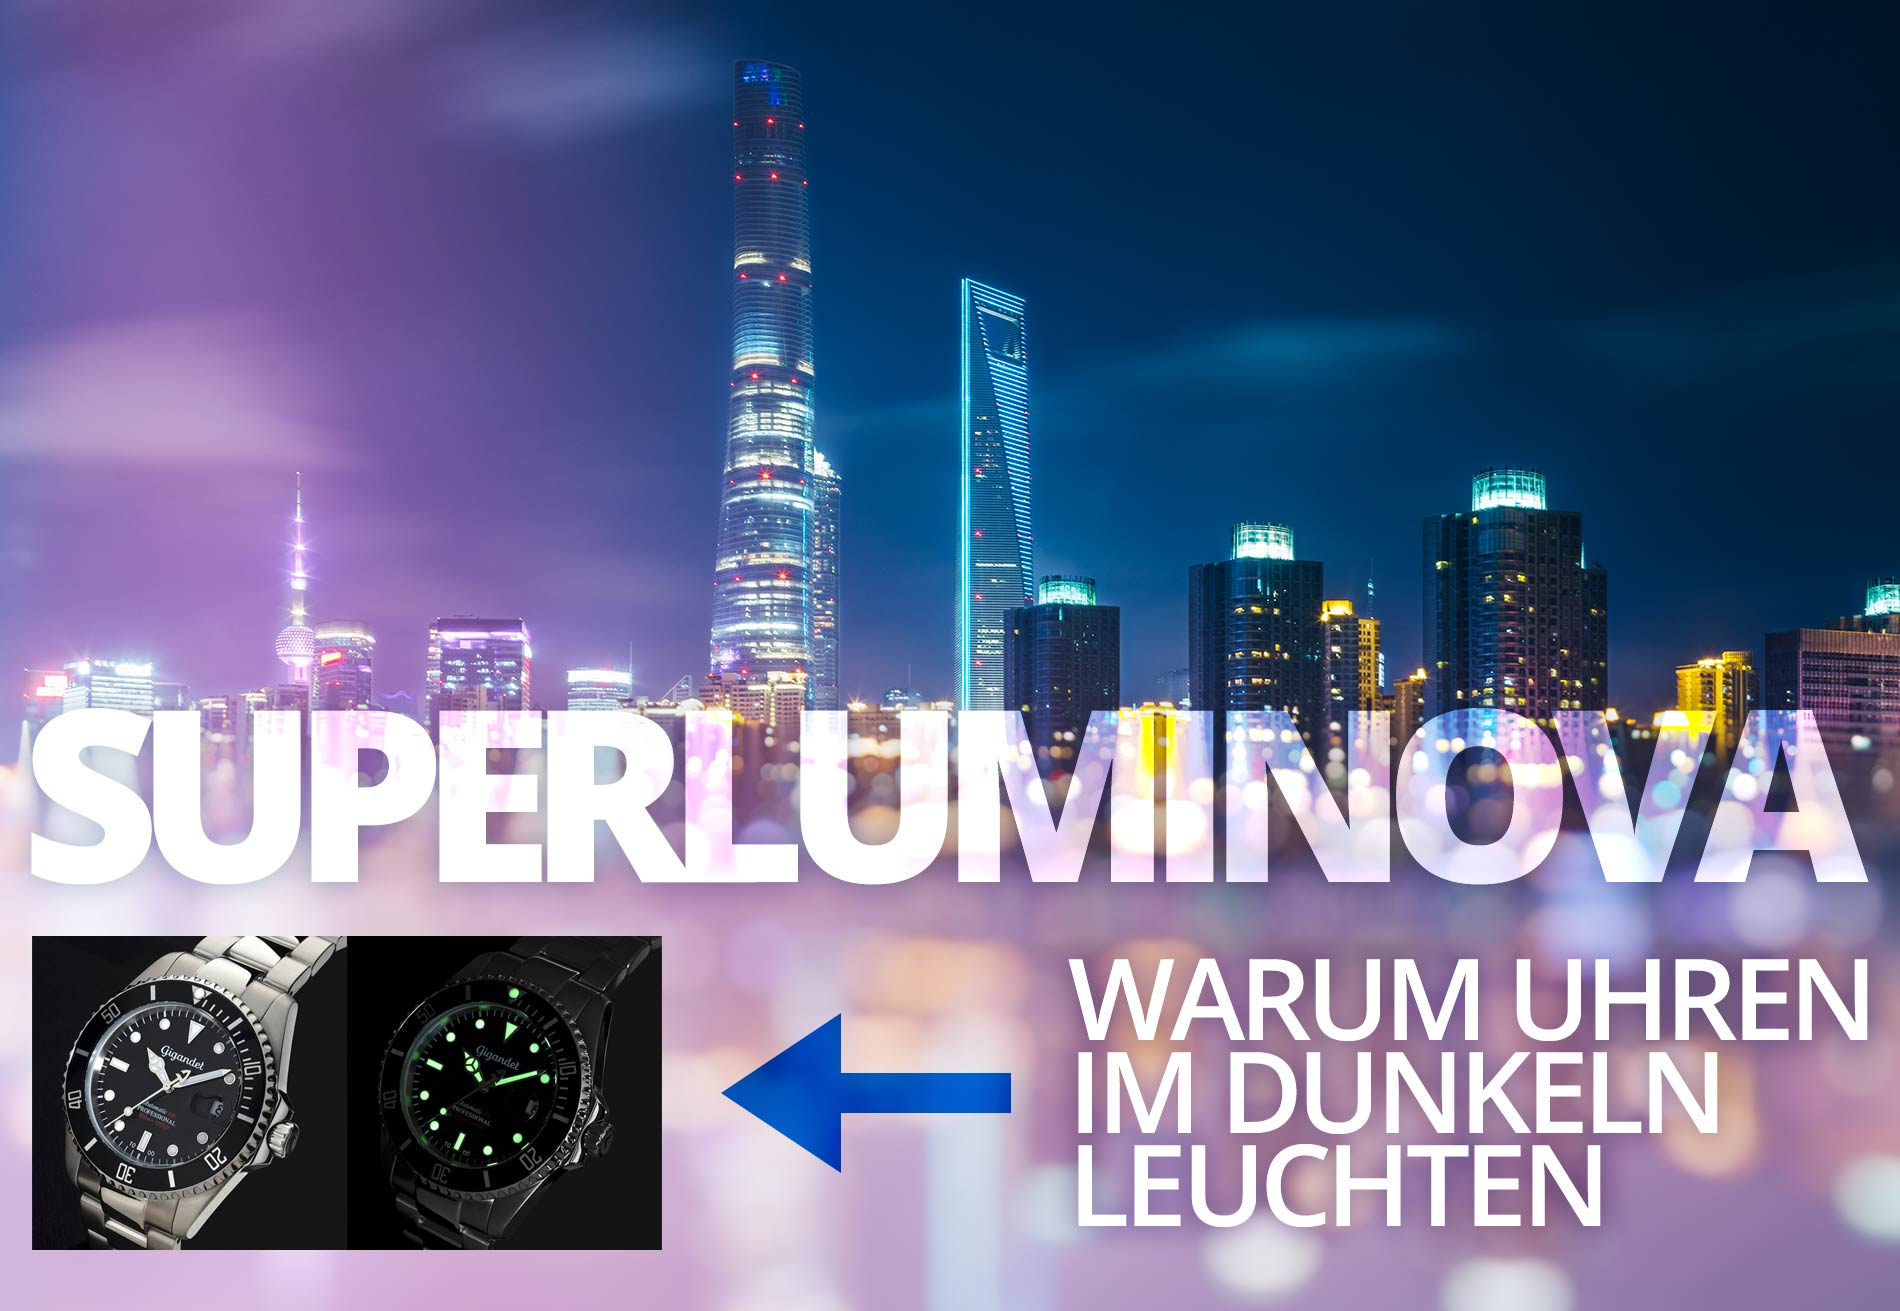 superluminova tritium radium warum uhren im dunkeln leuchten. Black Bedroom Furniture Sets. Home Design Ideas